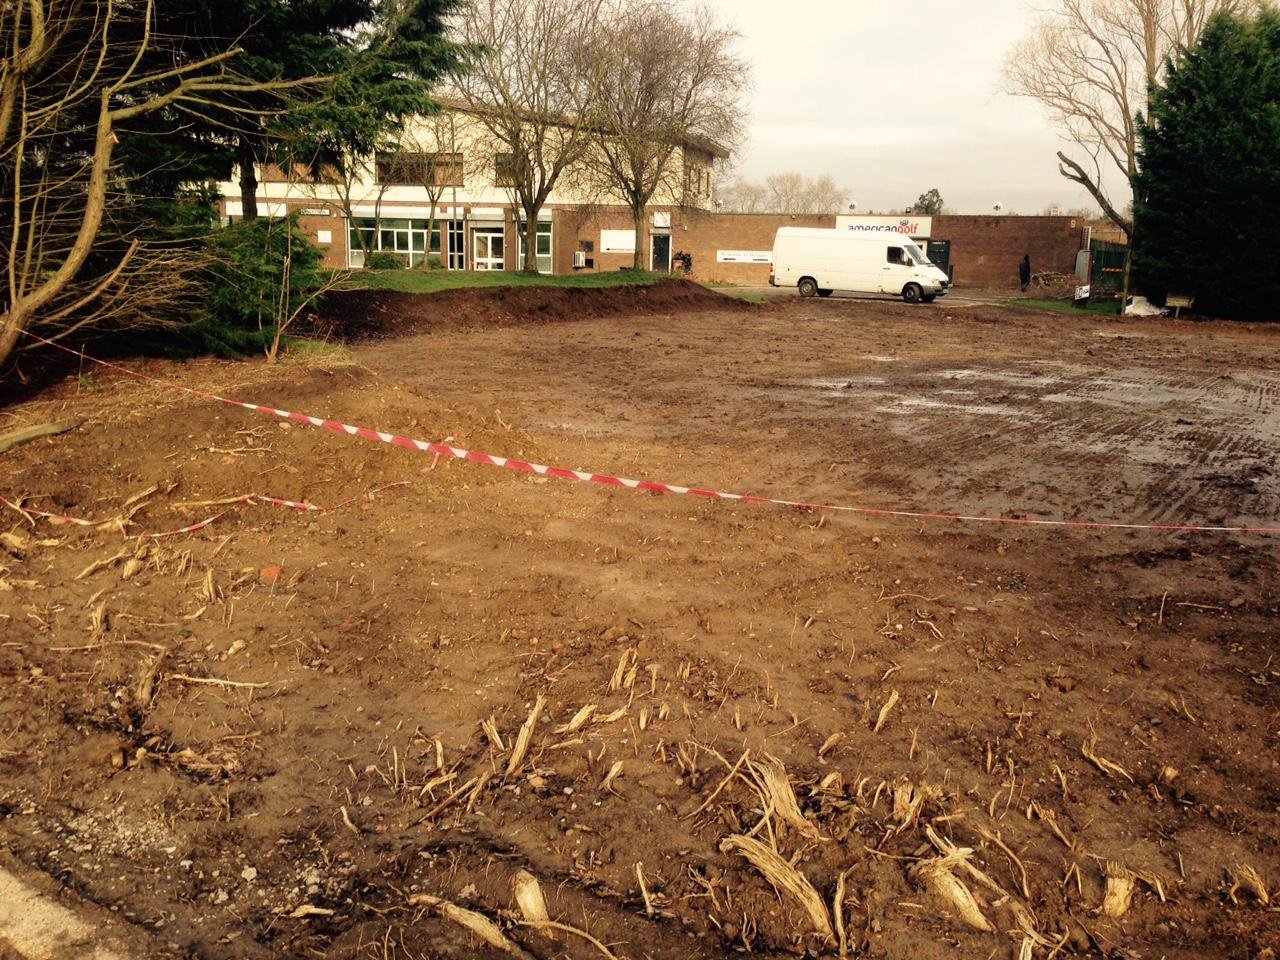 Alleged damage to Northampton Battlefield